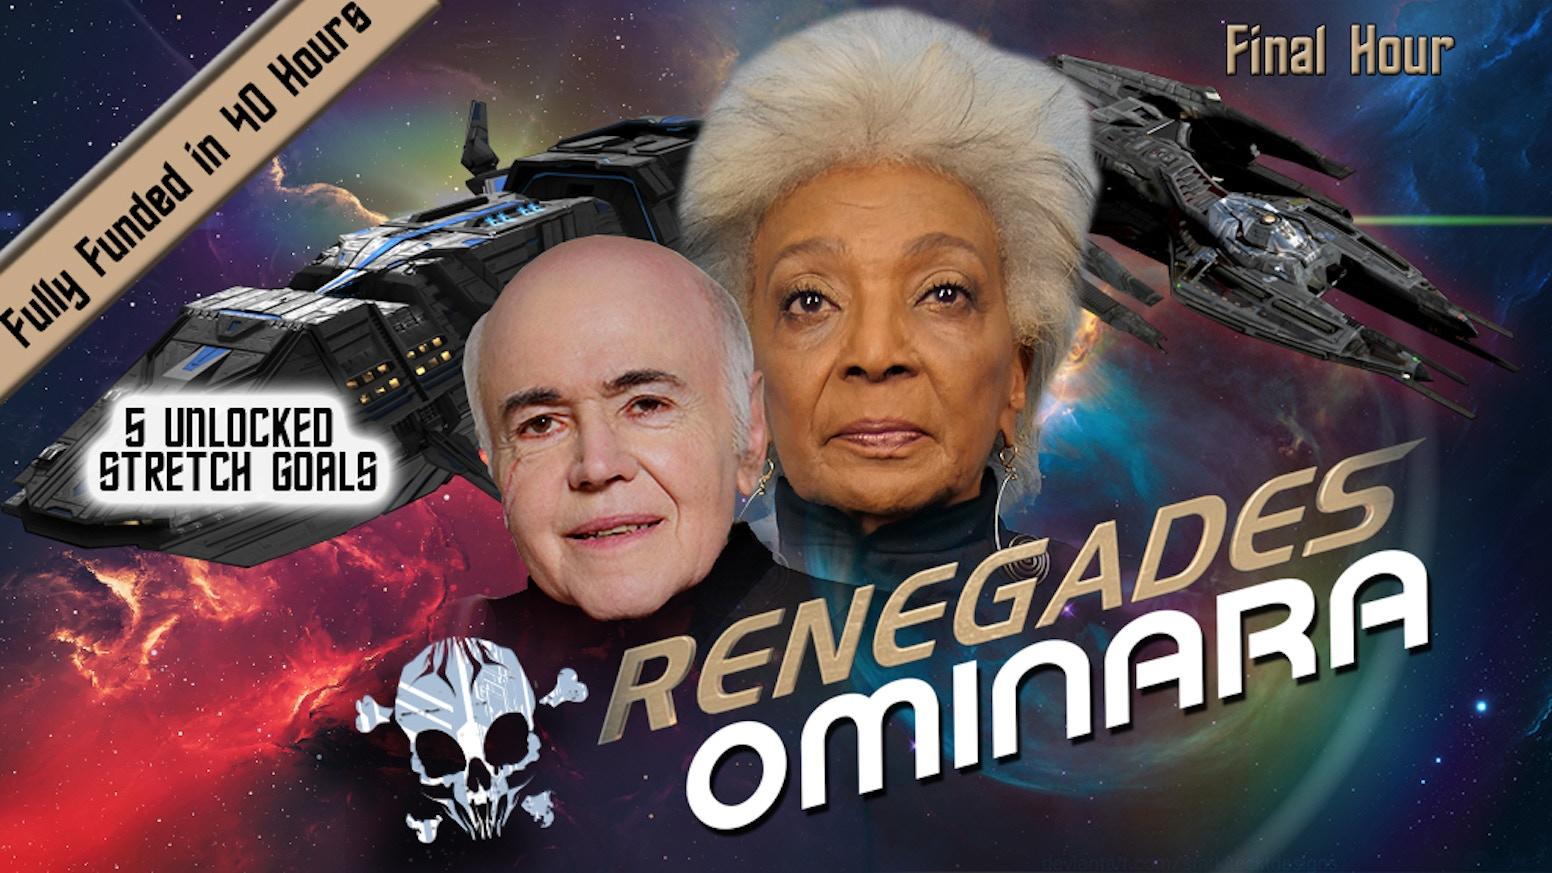 Nichelle Nichols creates her original role of Ominara and does her final scene with legendary Walter Koenig